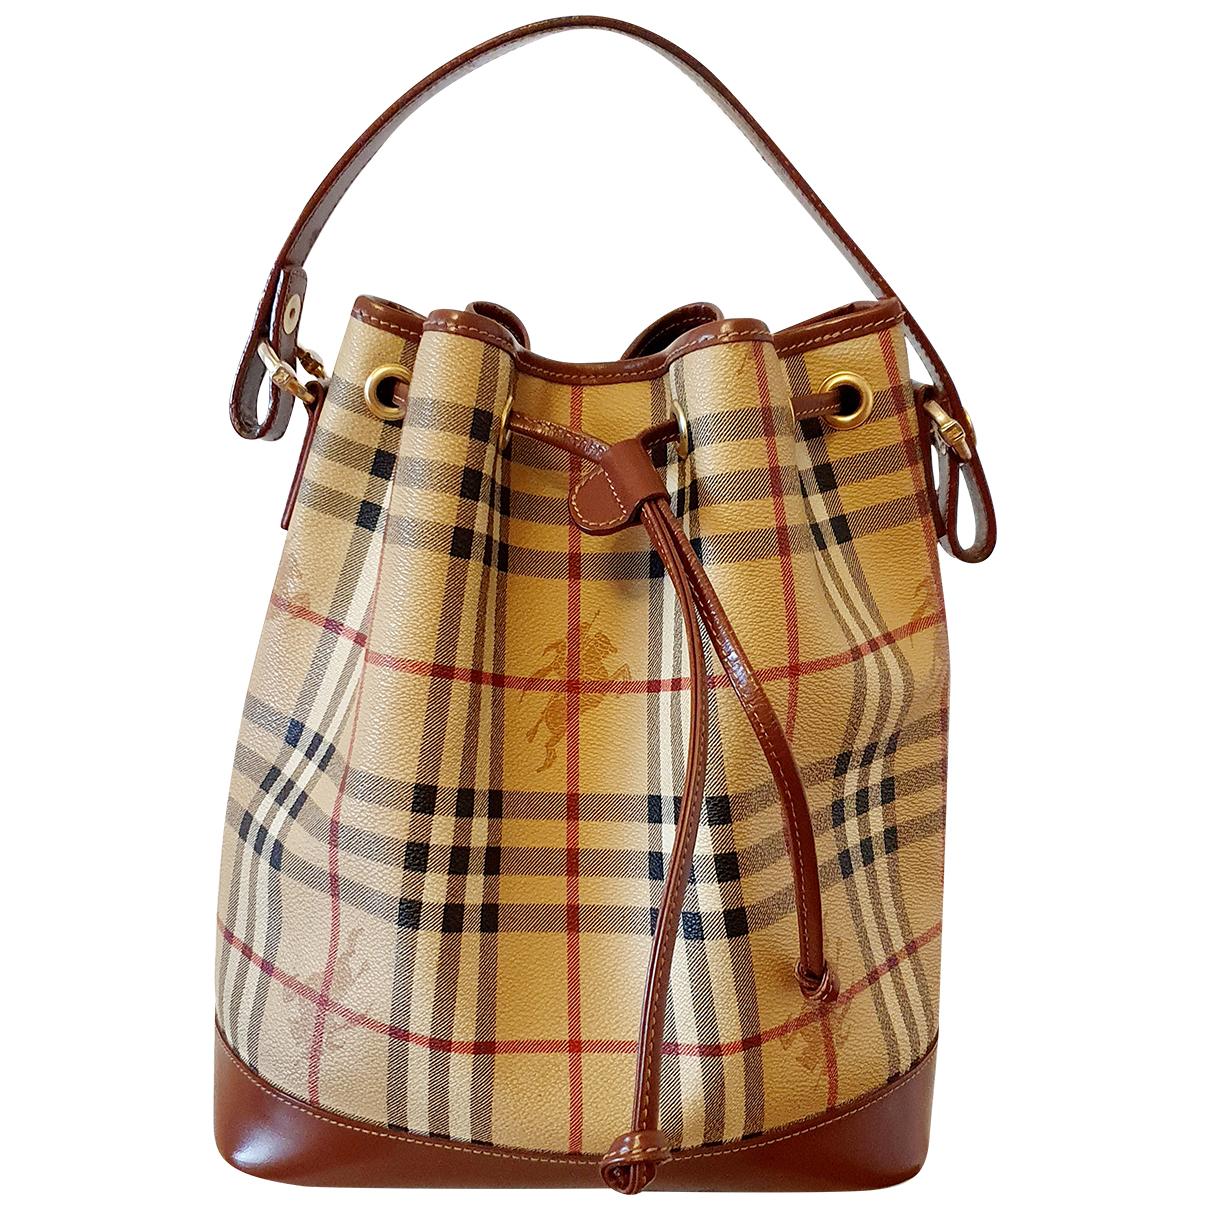 Burberry N Beige Patent leather handbag for Women N